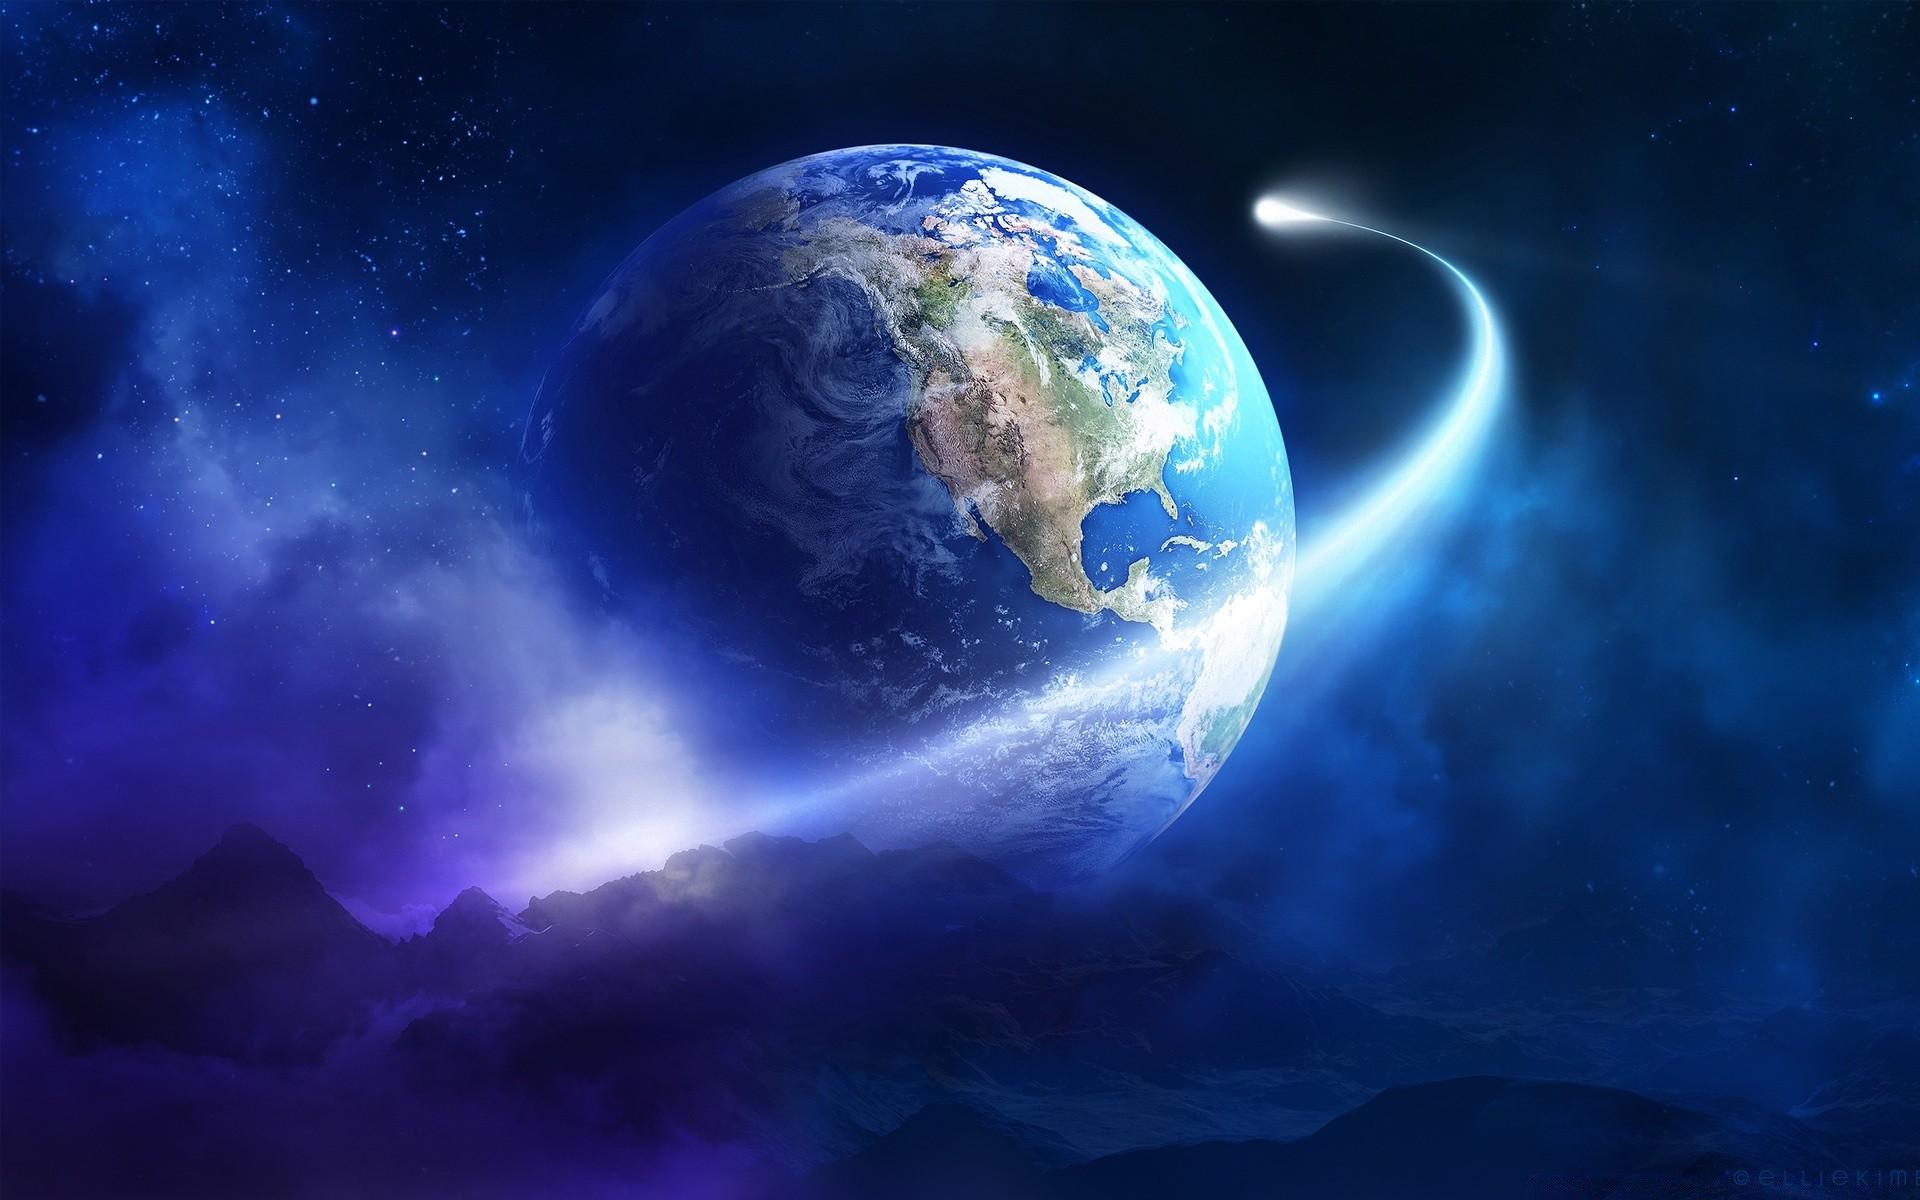 Открытка 9-я планета, букеты марта картинки